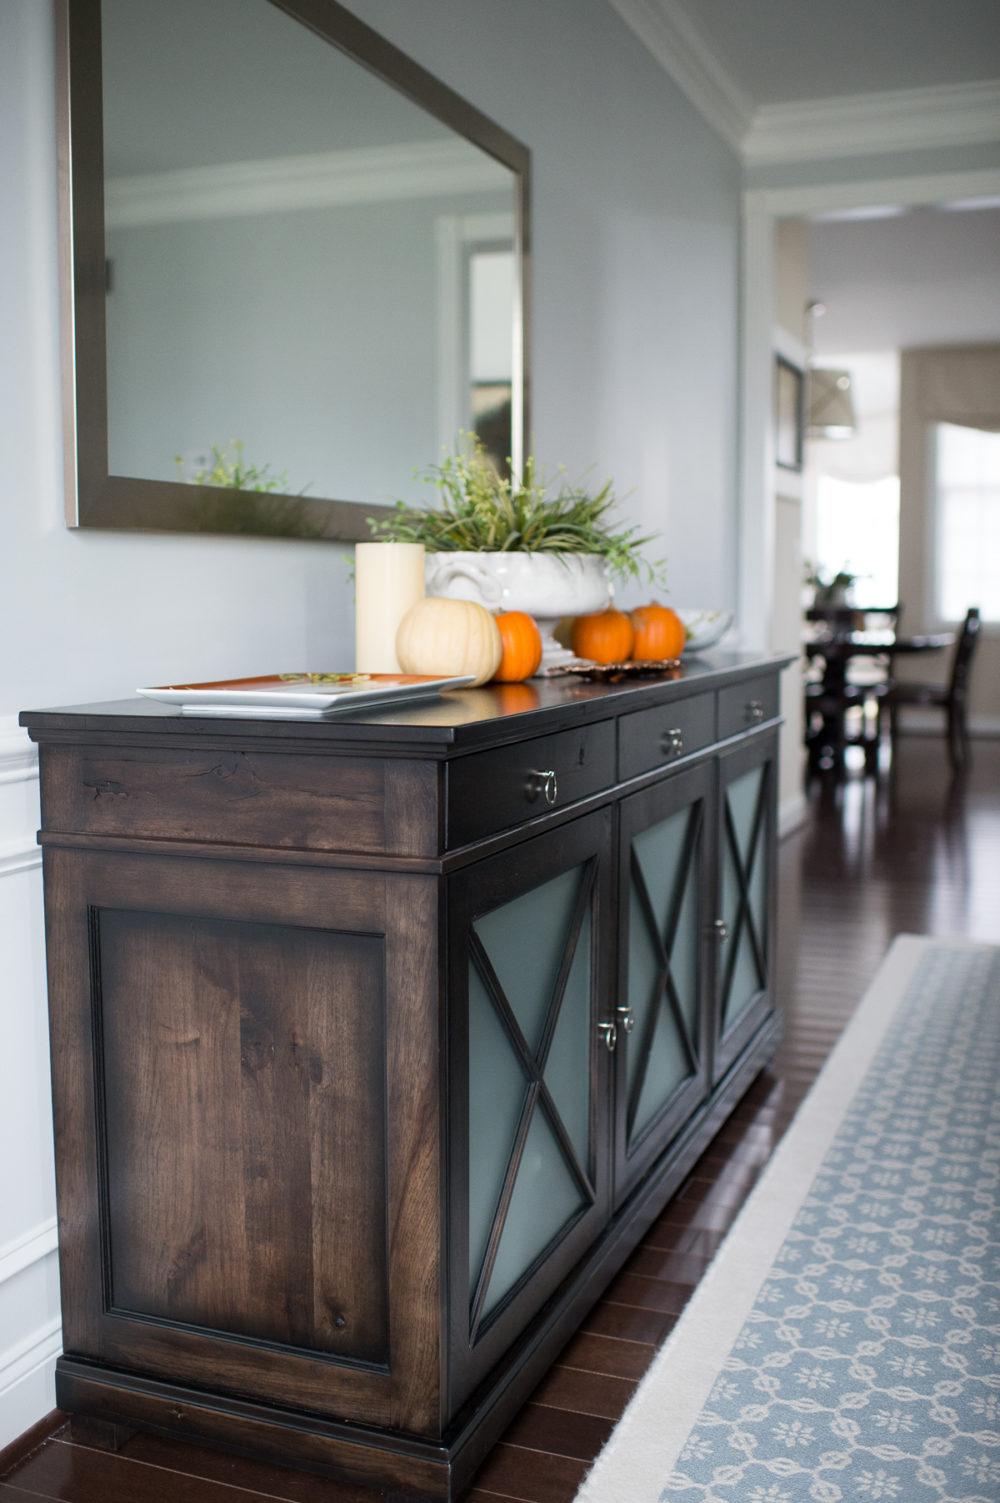 Petite Fashion and Style Blog | Williams Sonoma In Home Consultation | Williams Sonoma Acorn Plates | Click to Read More...